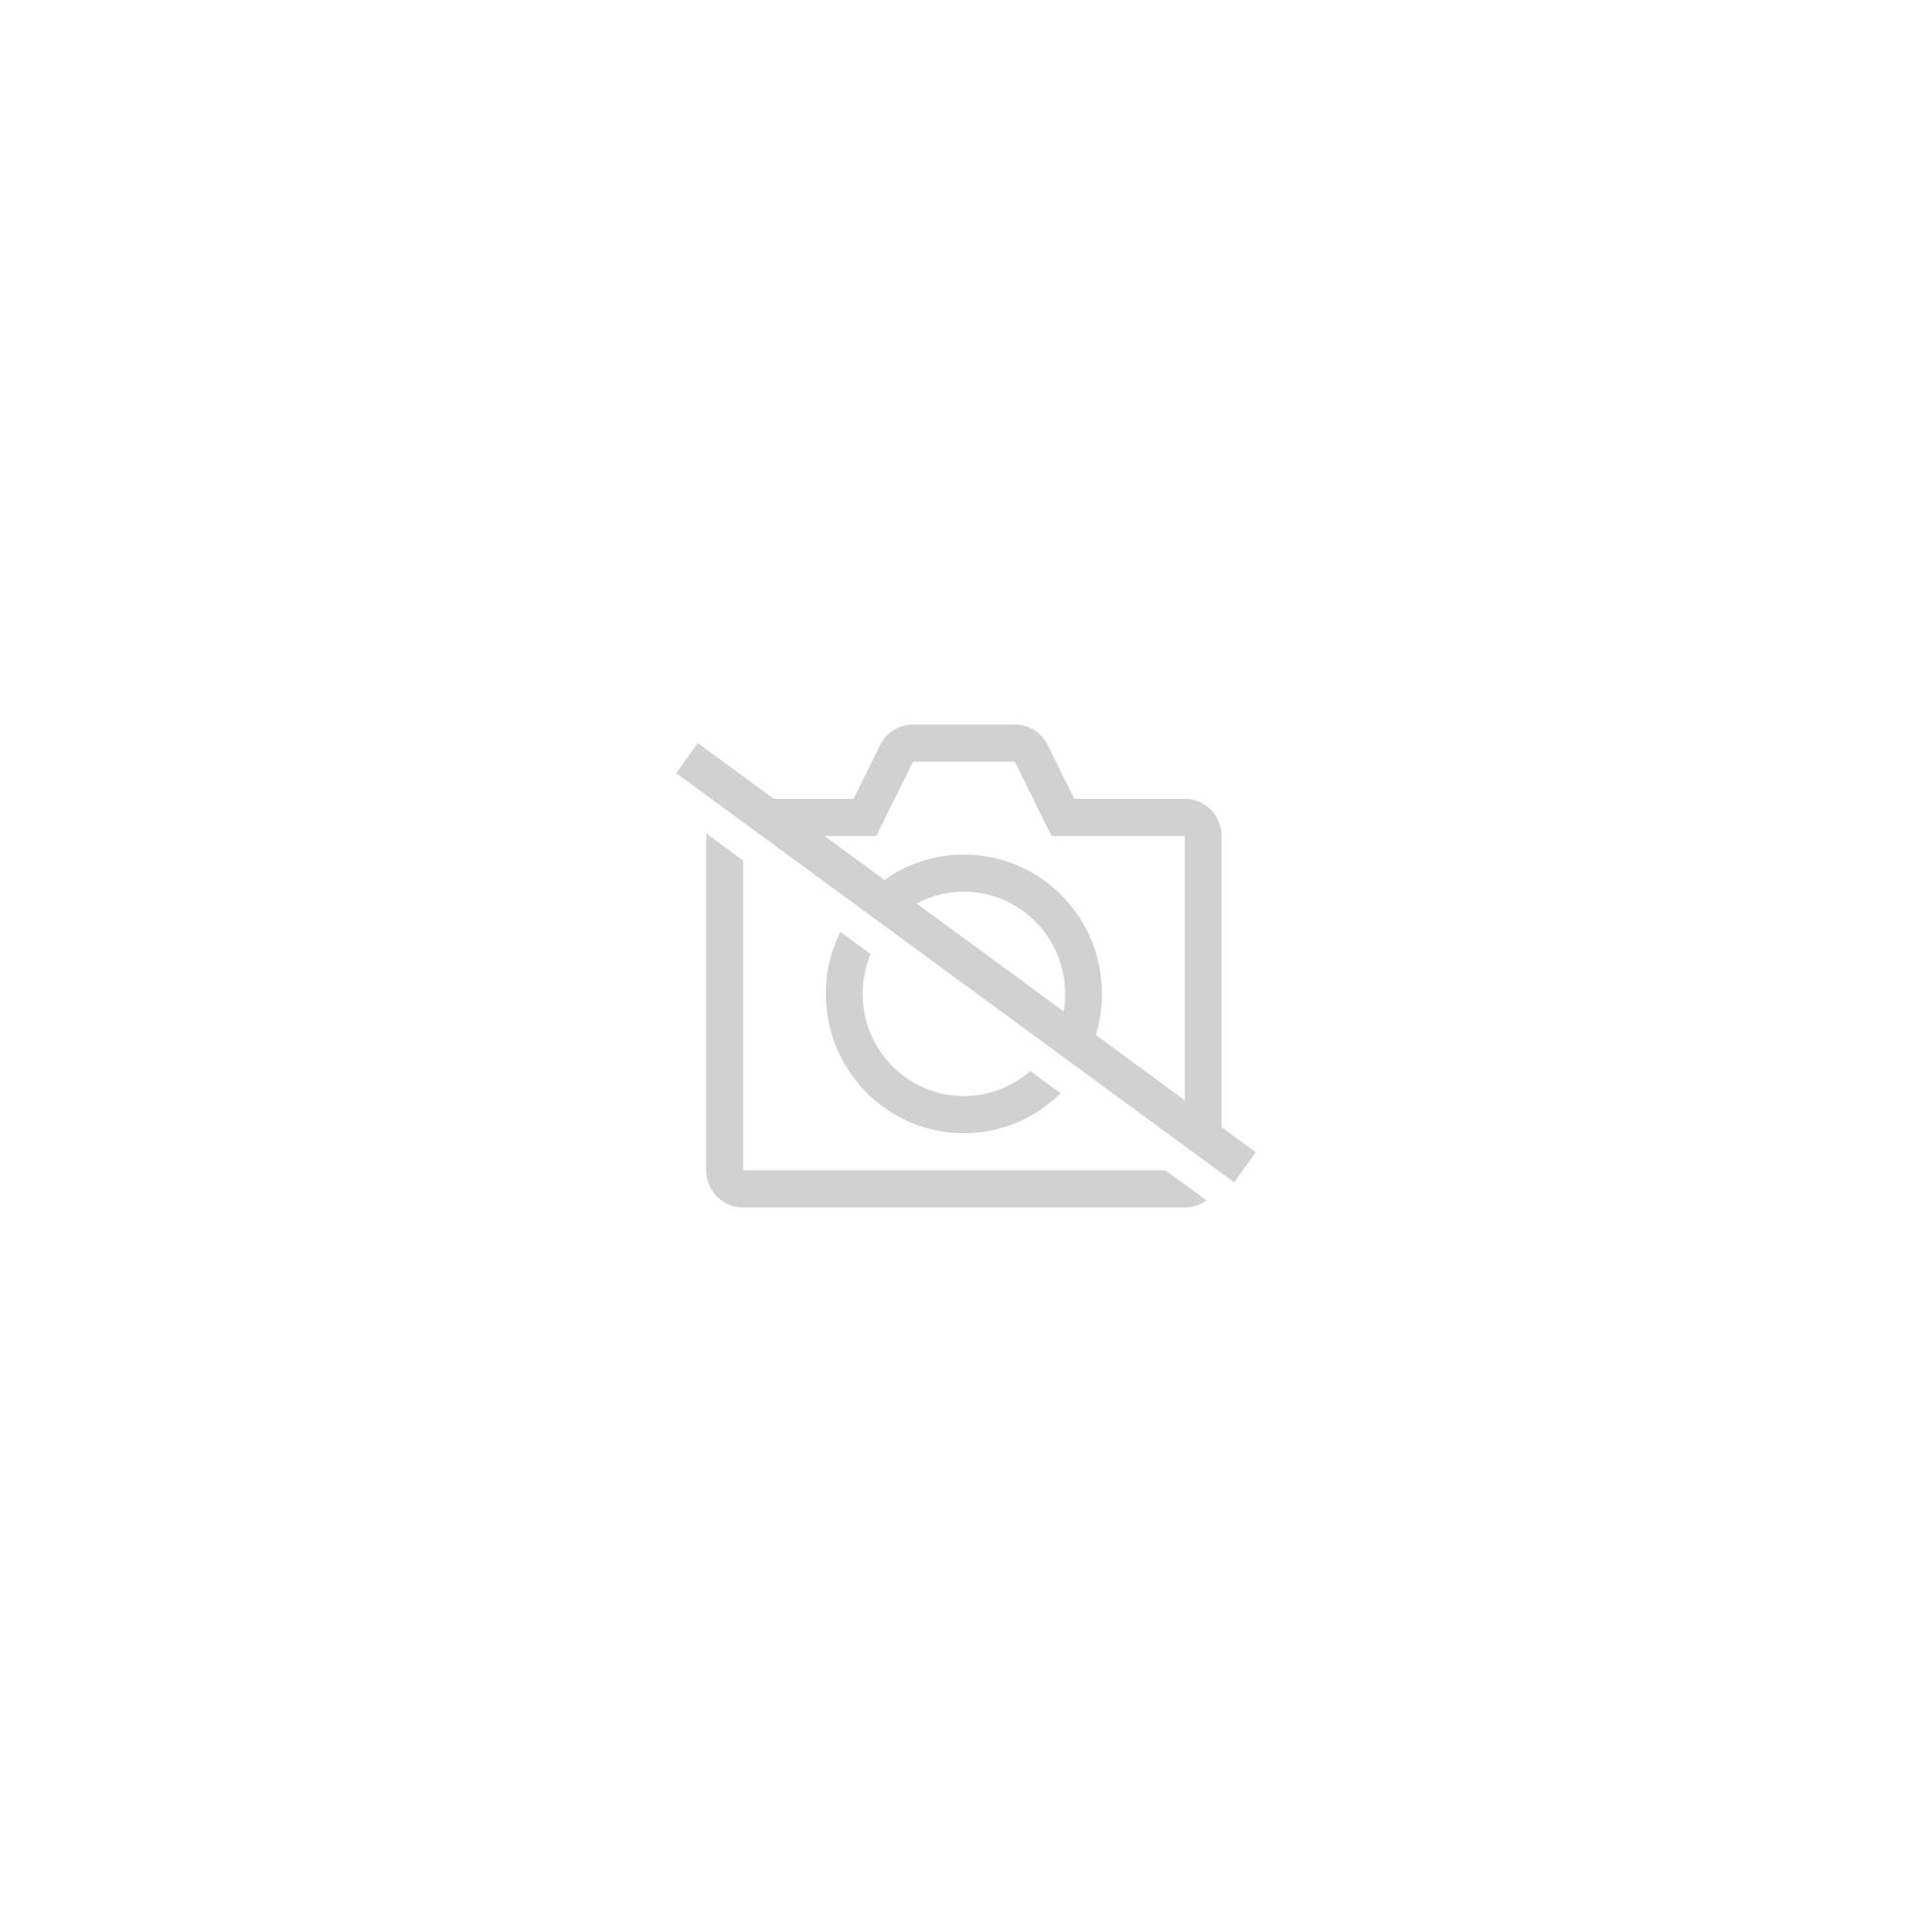 Intelligente De D'aluminium Bureau Alliage Lampe Pliage Bluetooth Led Parleur Haut JuTK1Fl3c